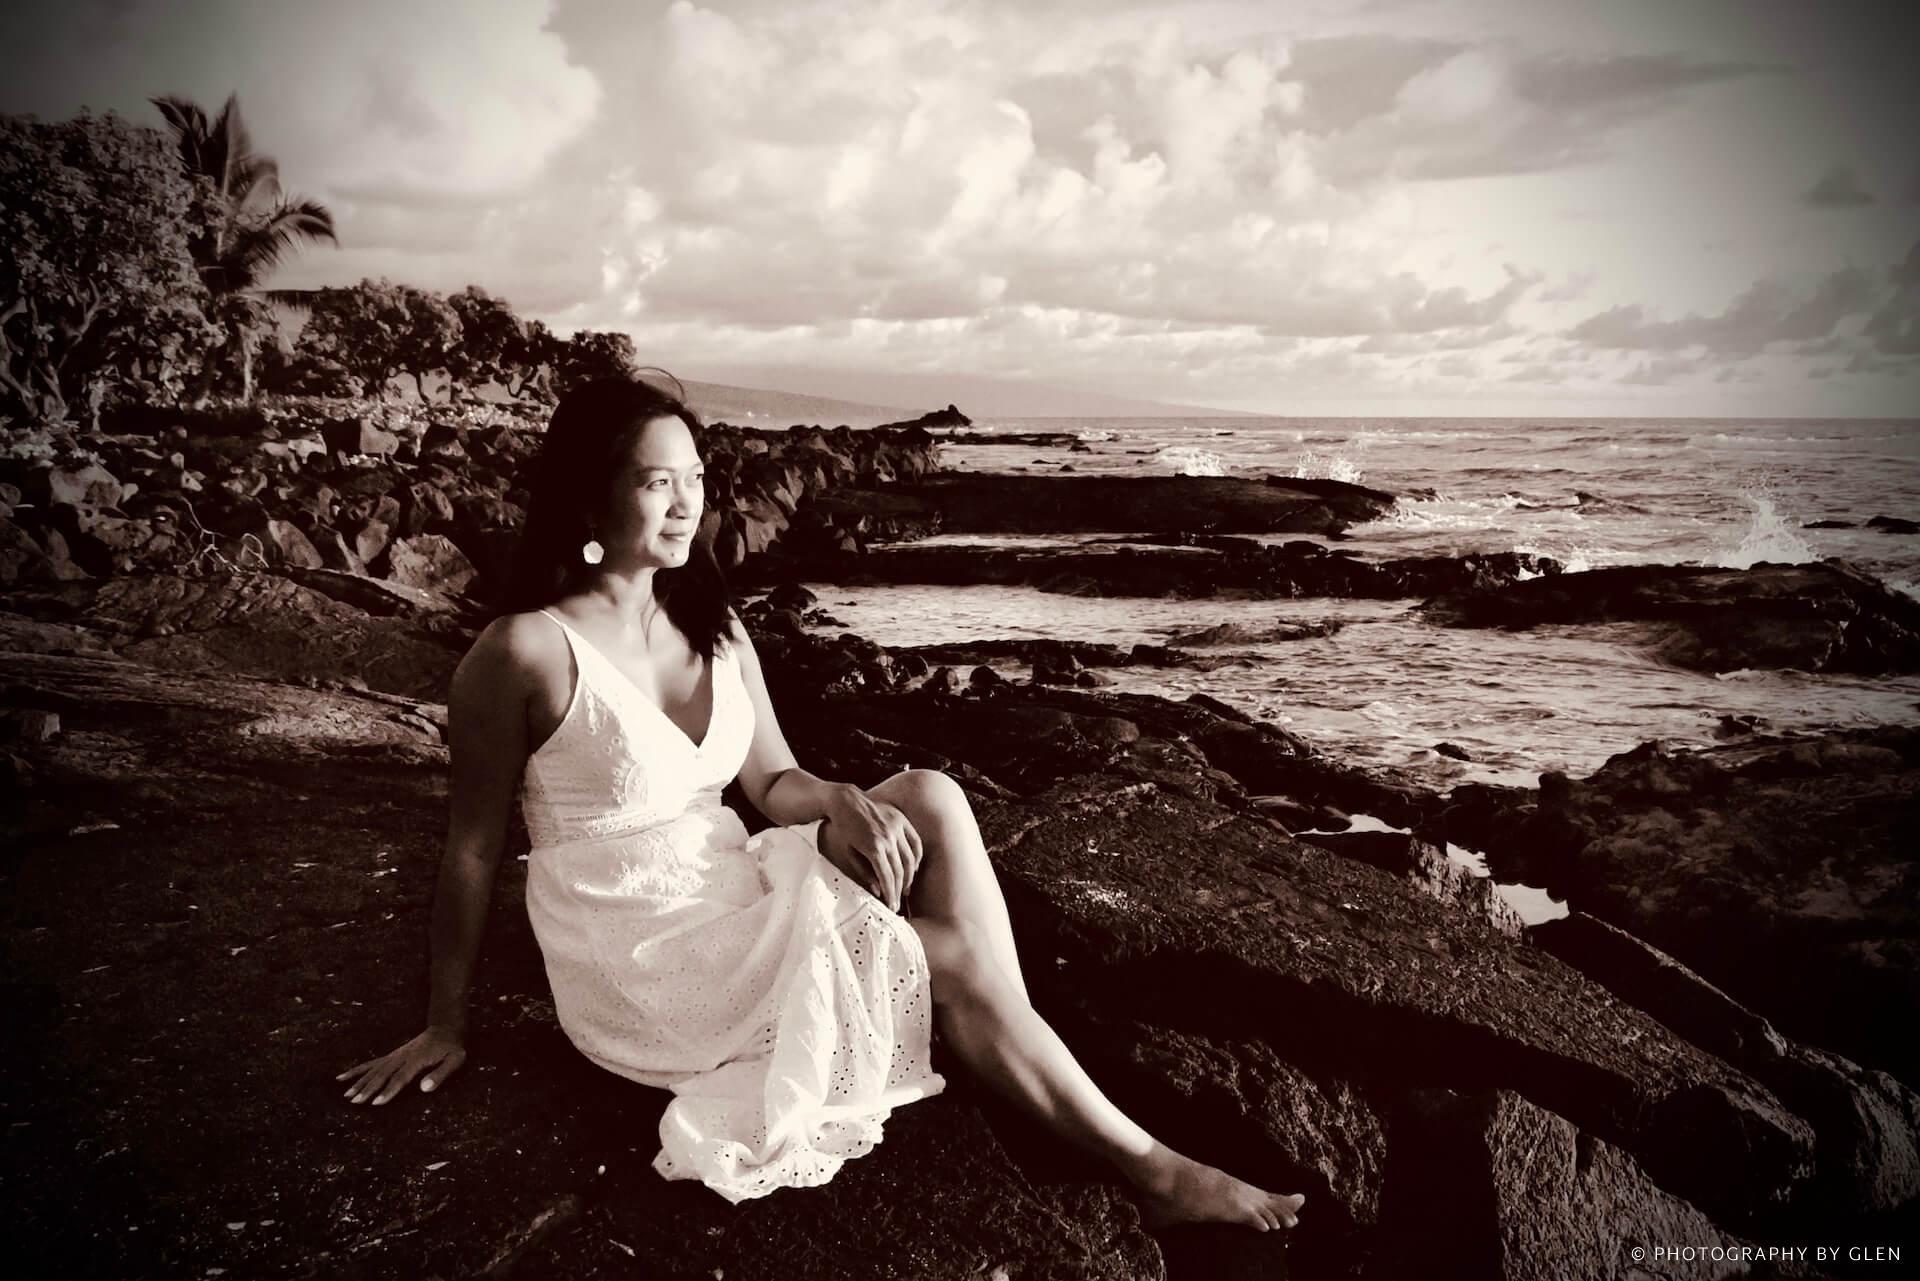 Portrait Photography in Kona, Hawaii